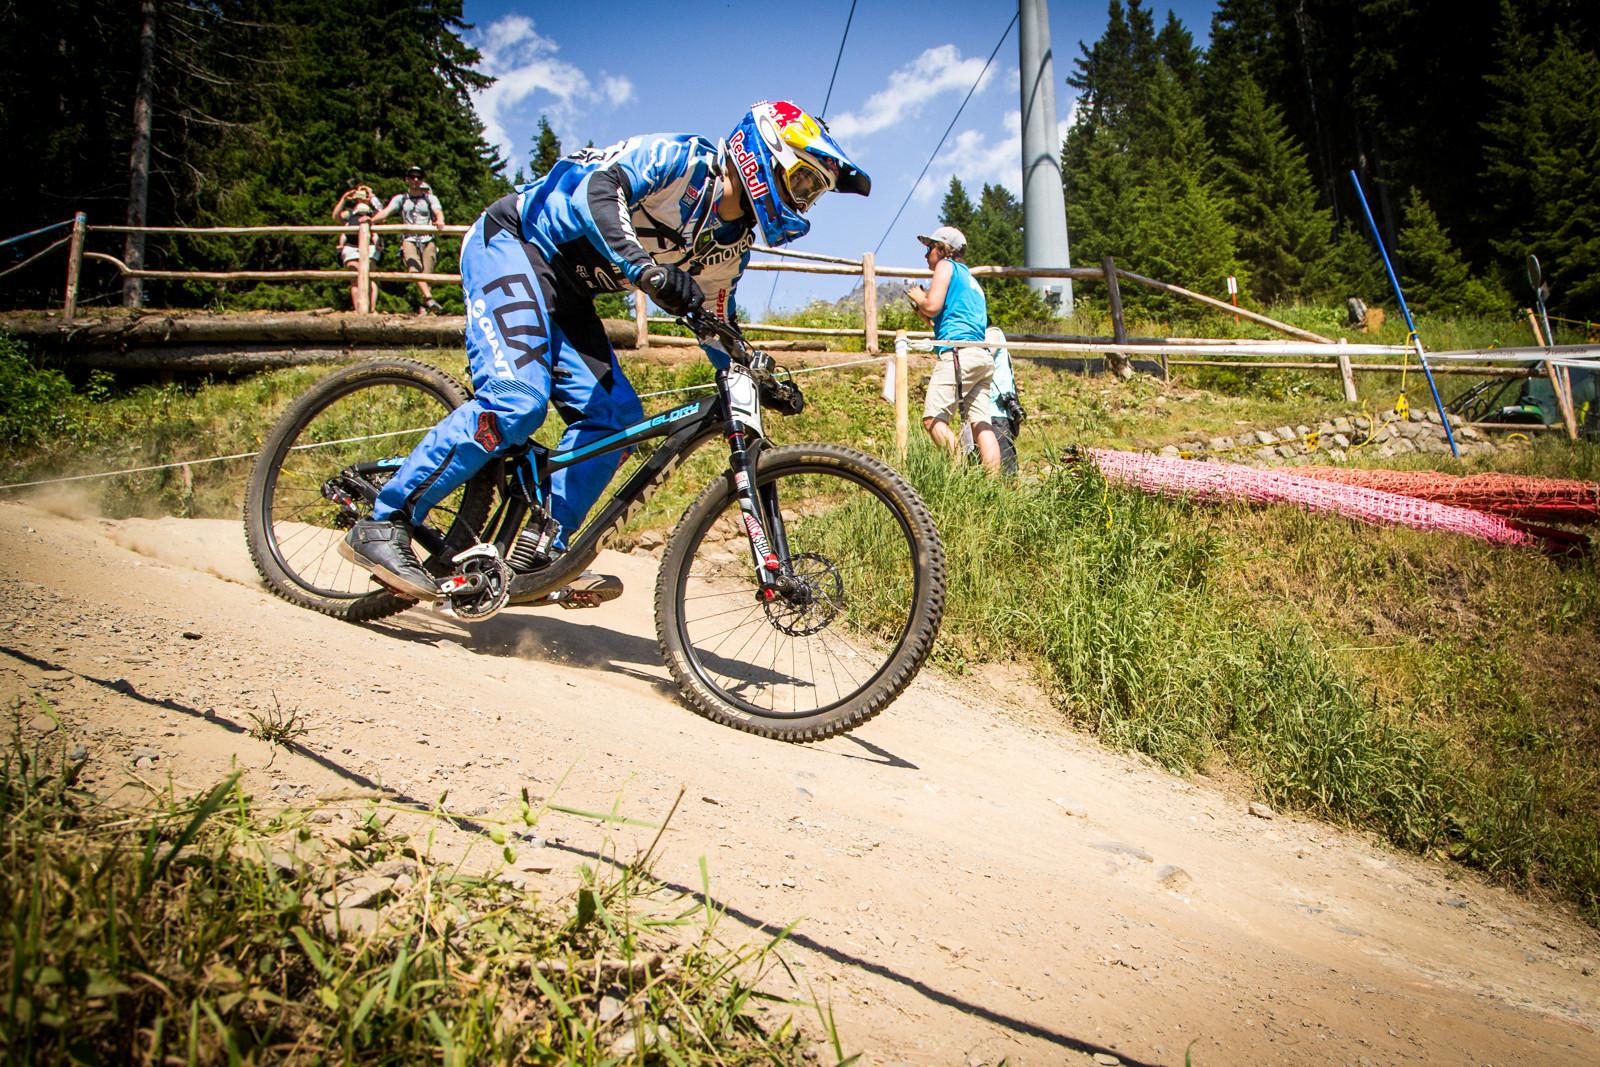 Marcelo Gutierrez, G-Out Project, Lenzerheide World Cup - G-Out Project - Lenzerheide World Cup - Mountain Biking Pictures - Vital MTB